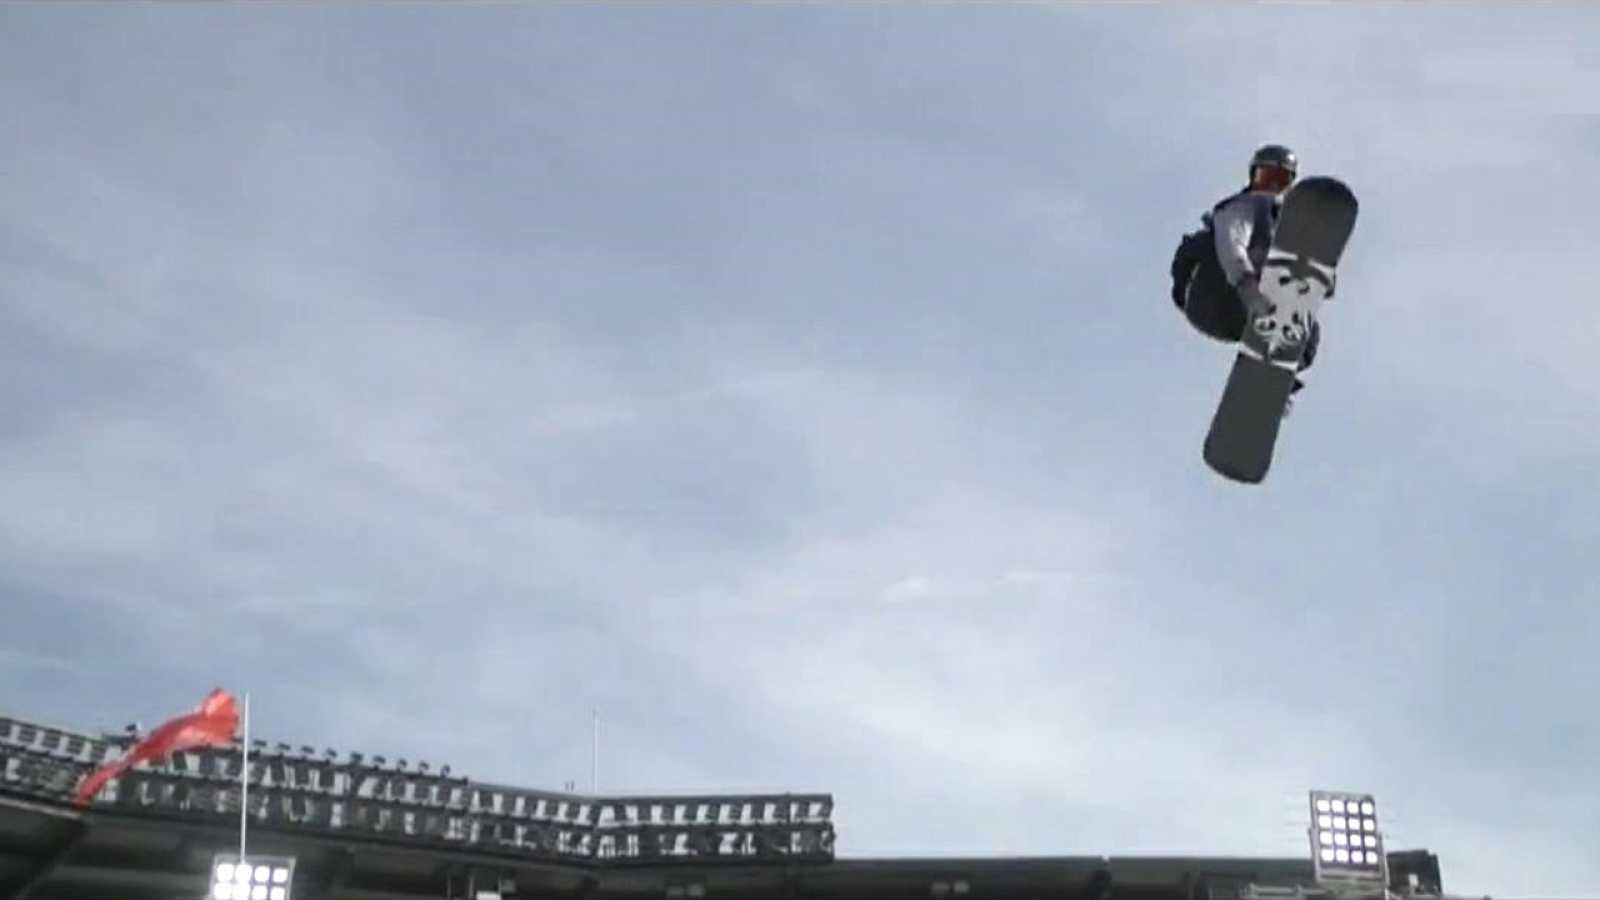 Snowboard - FIS Snowboard Copa del Mundo Magazine - Programa 3 - ver ahora